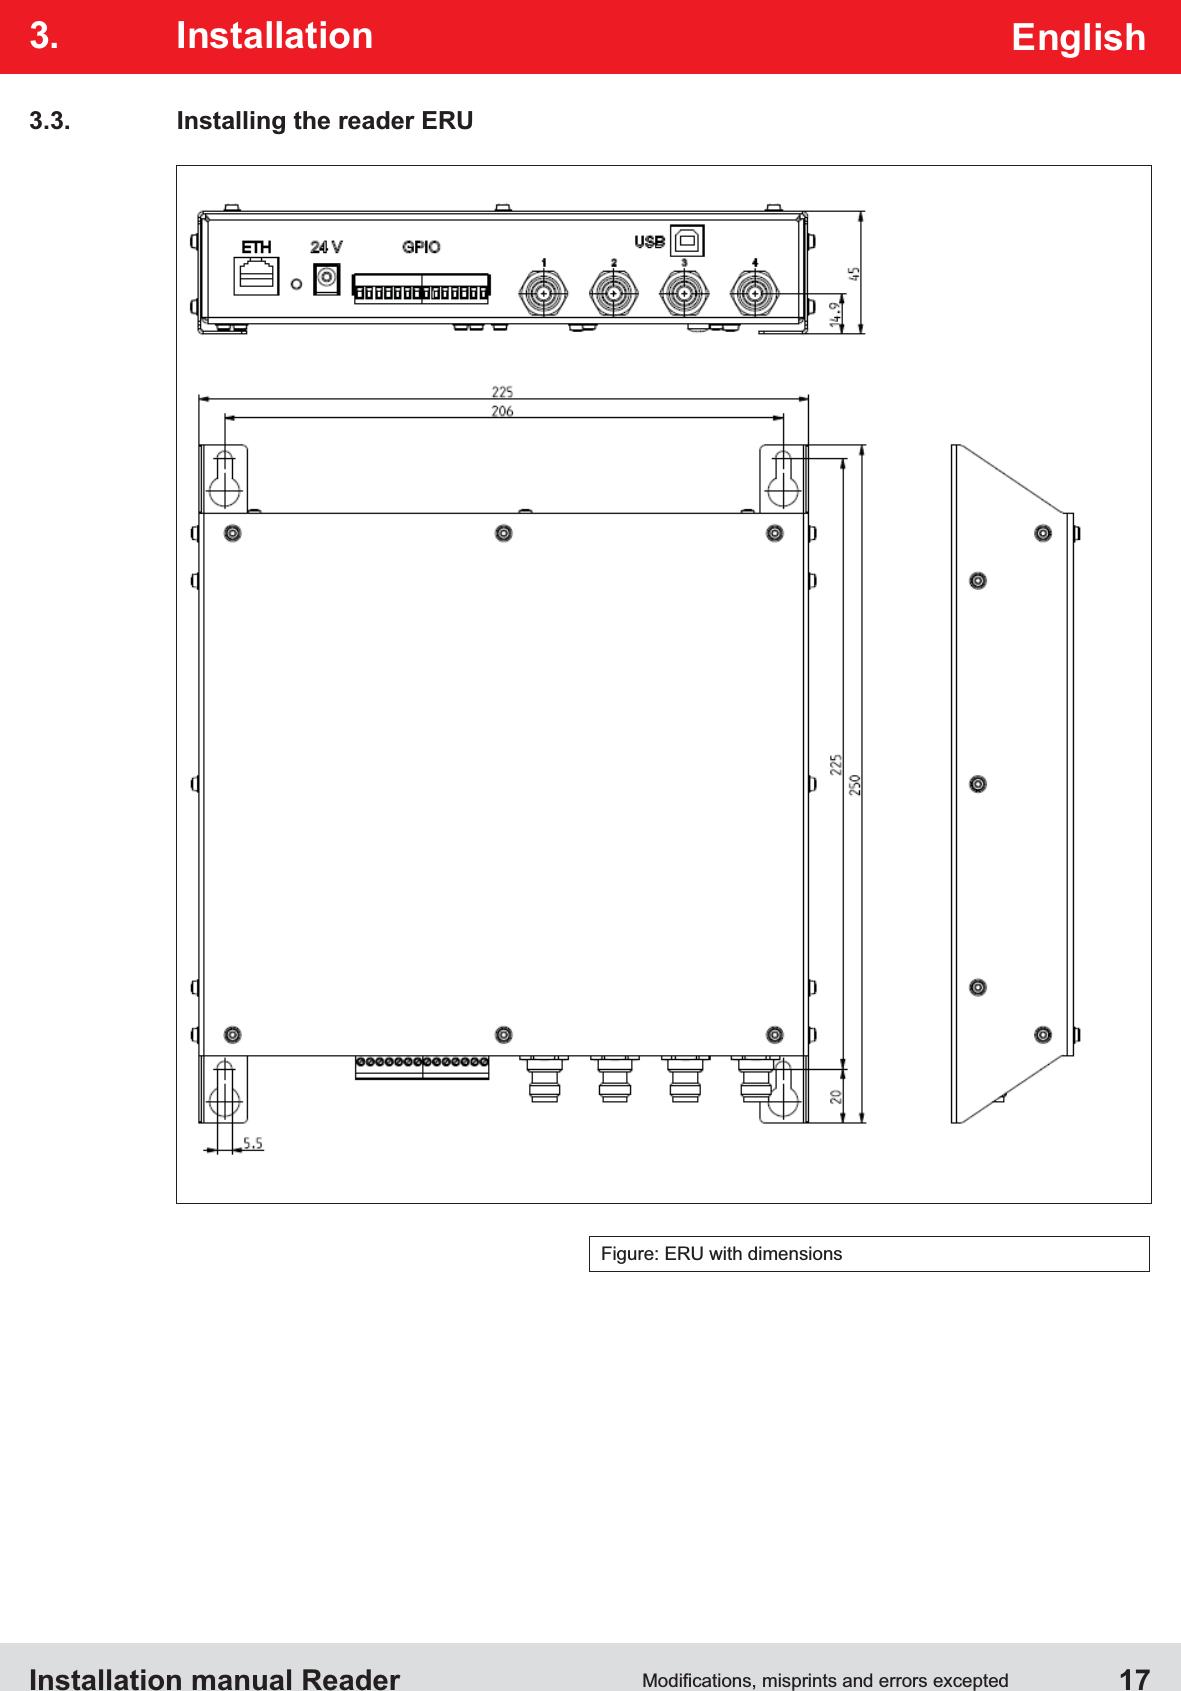 Installation manual Reader  17EnglishFigure: ERU with dimensions3.3.  Installing the reader ERU3. Installation